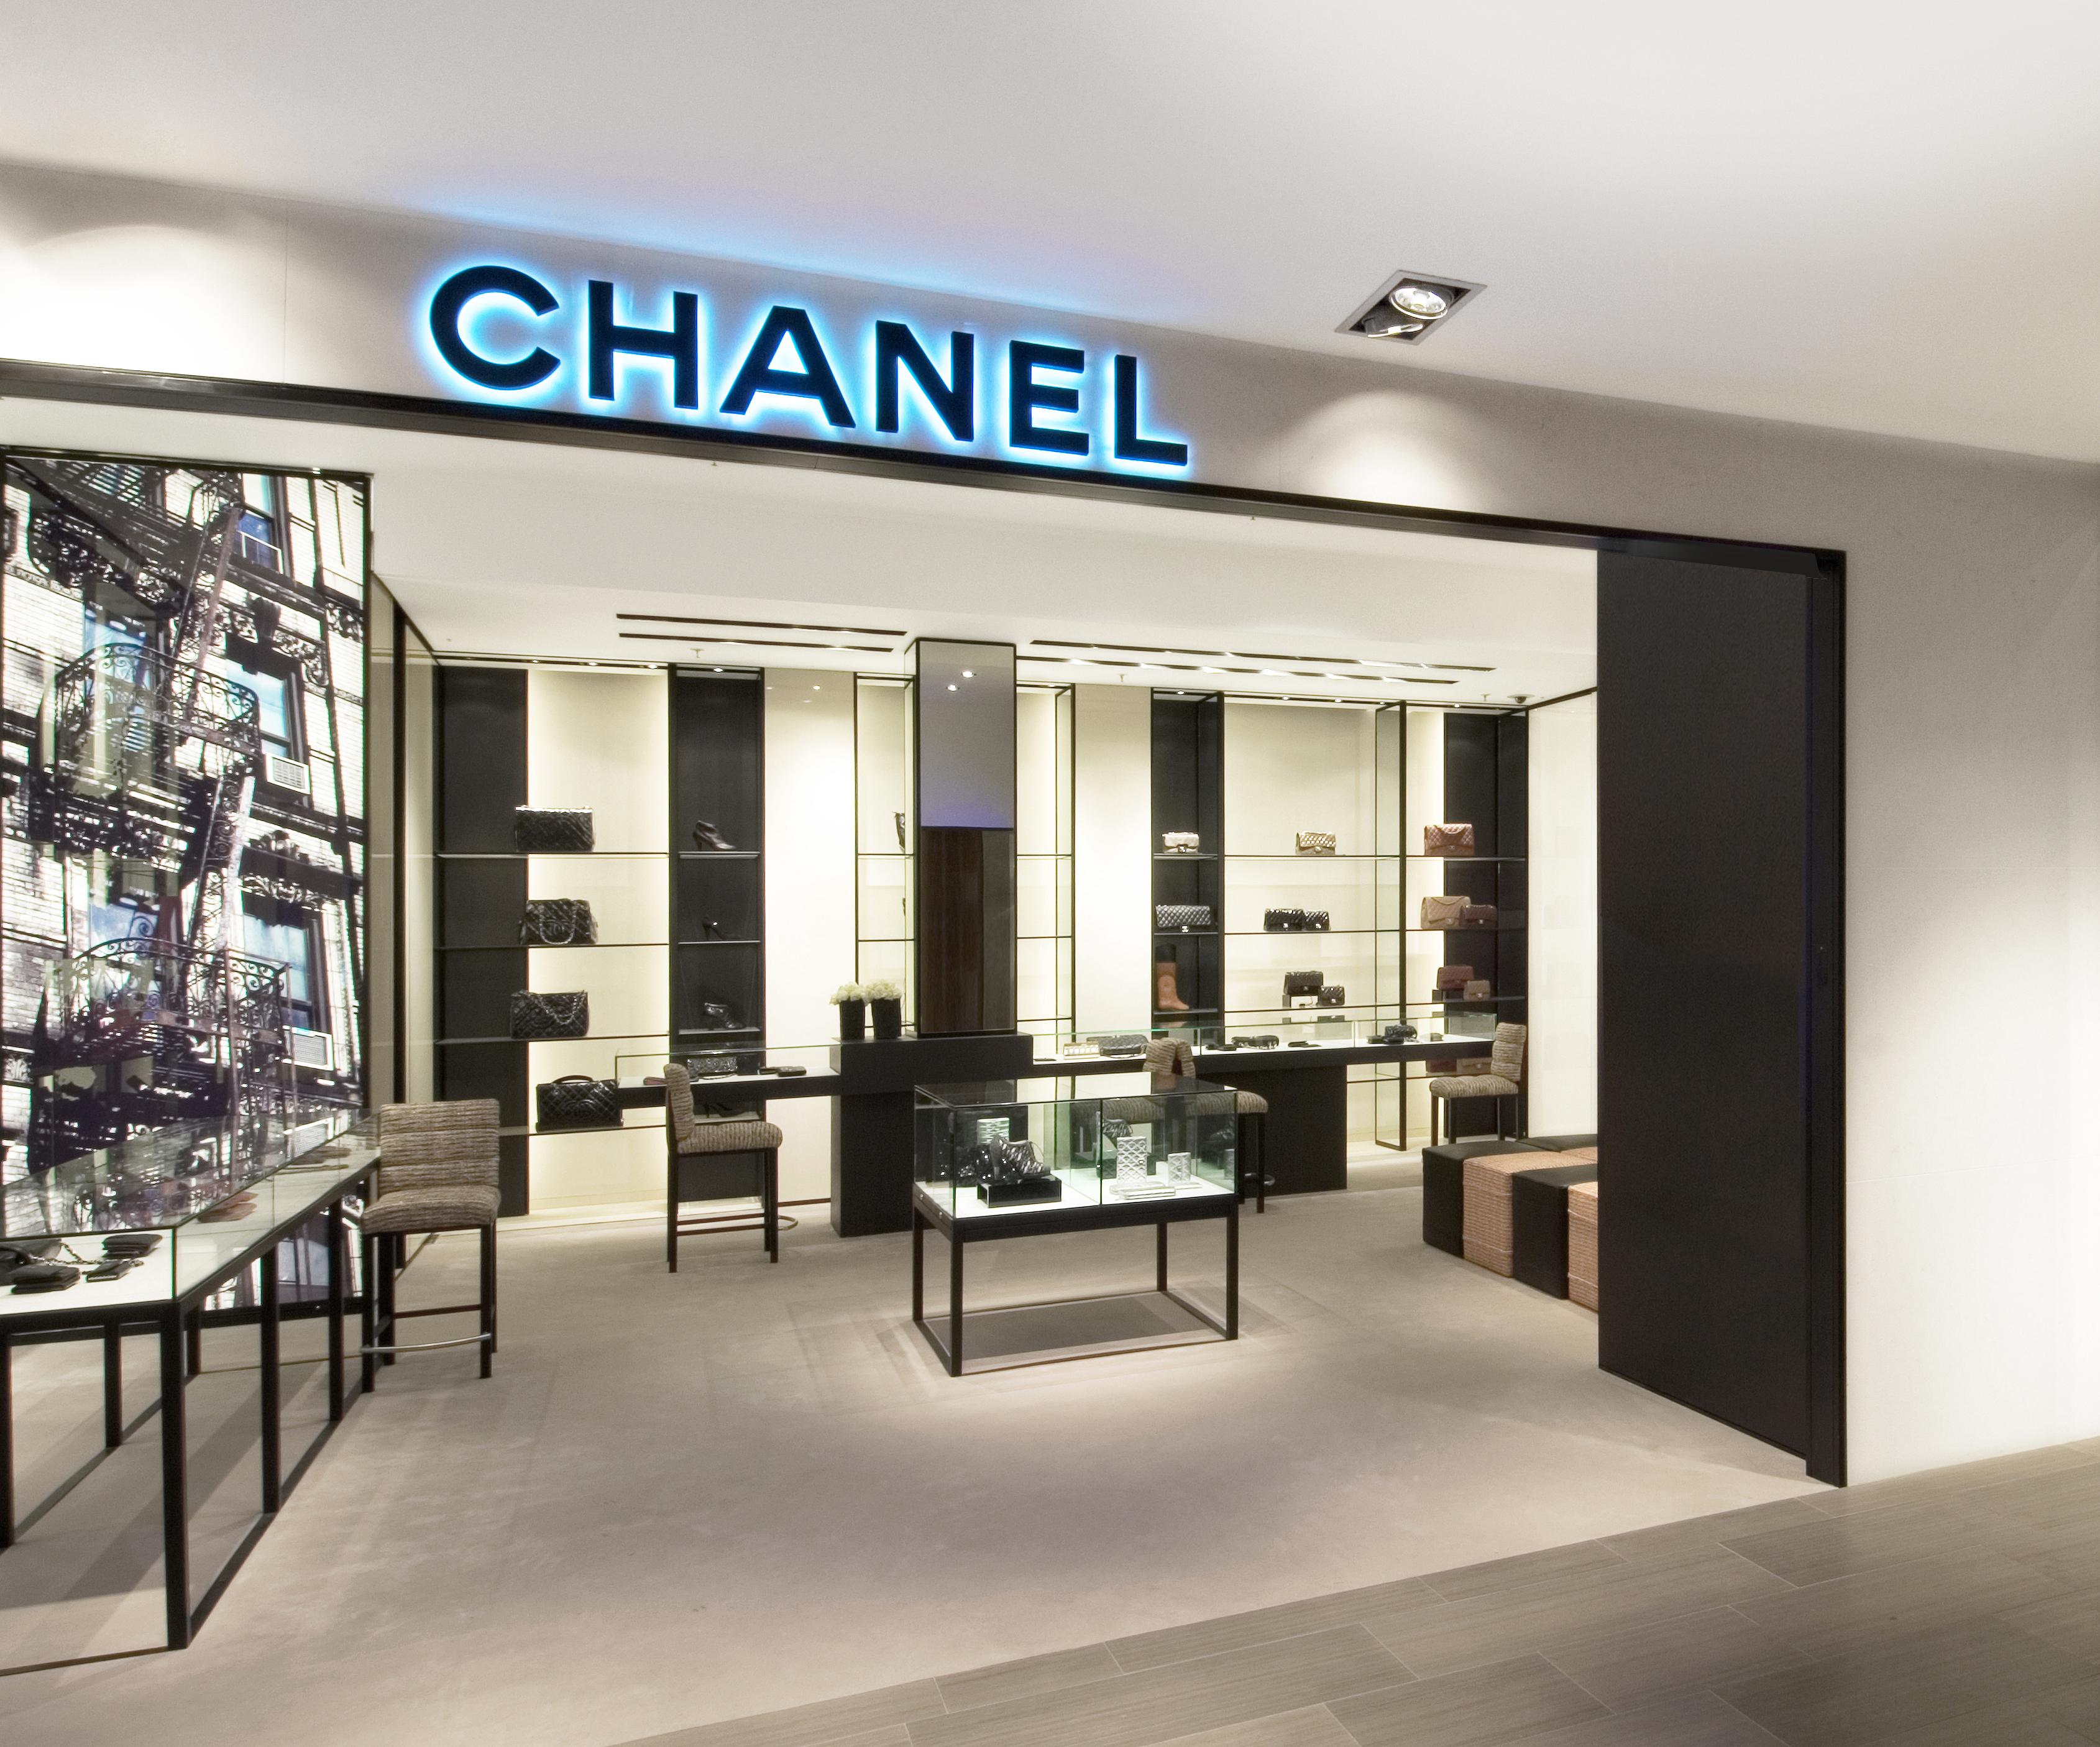 Chanel Genf